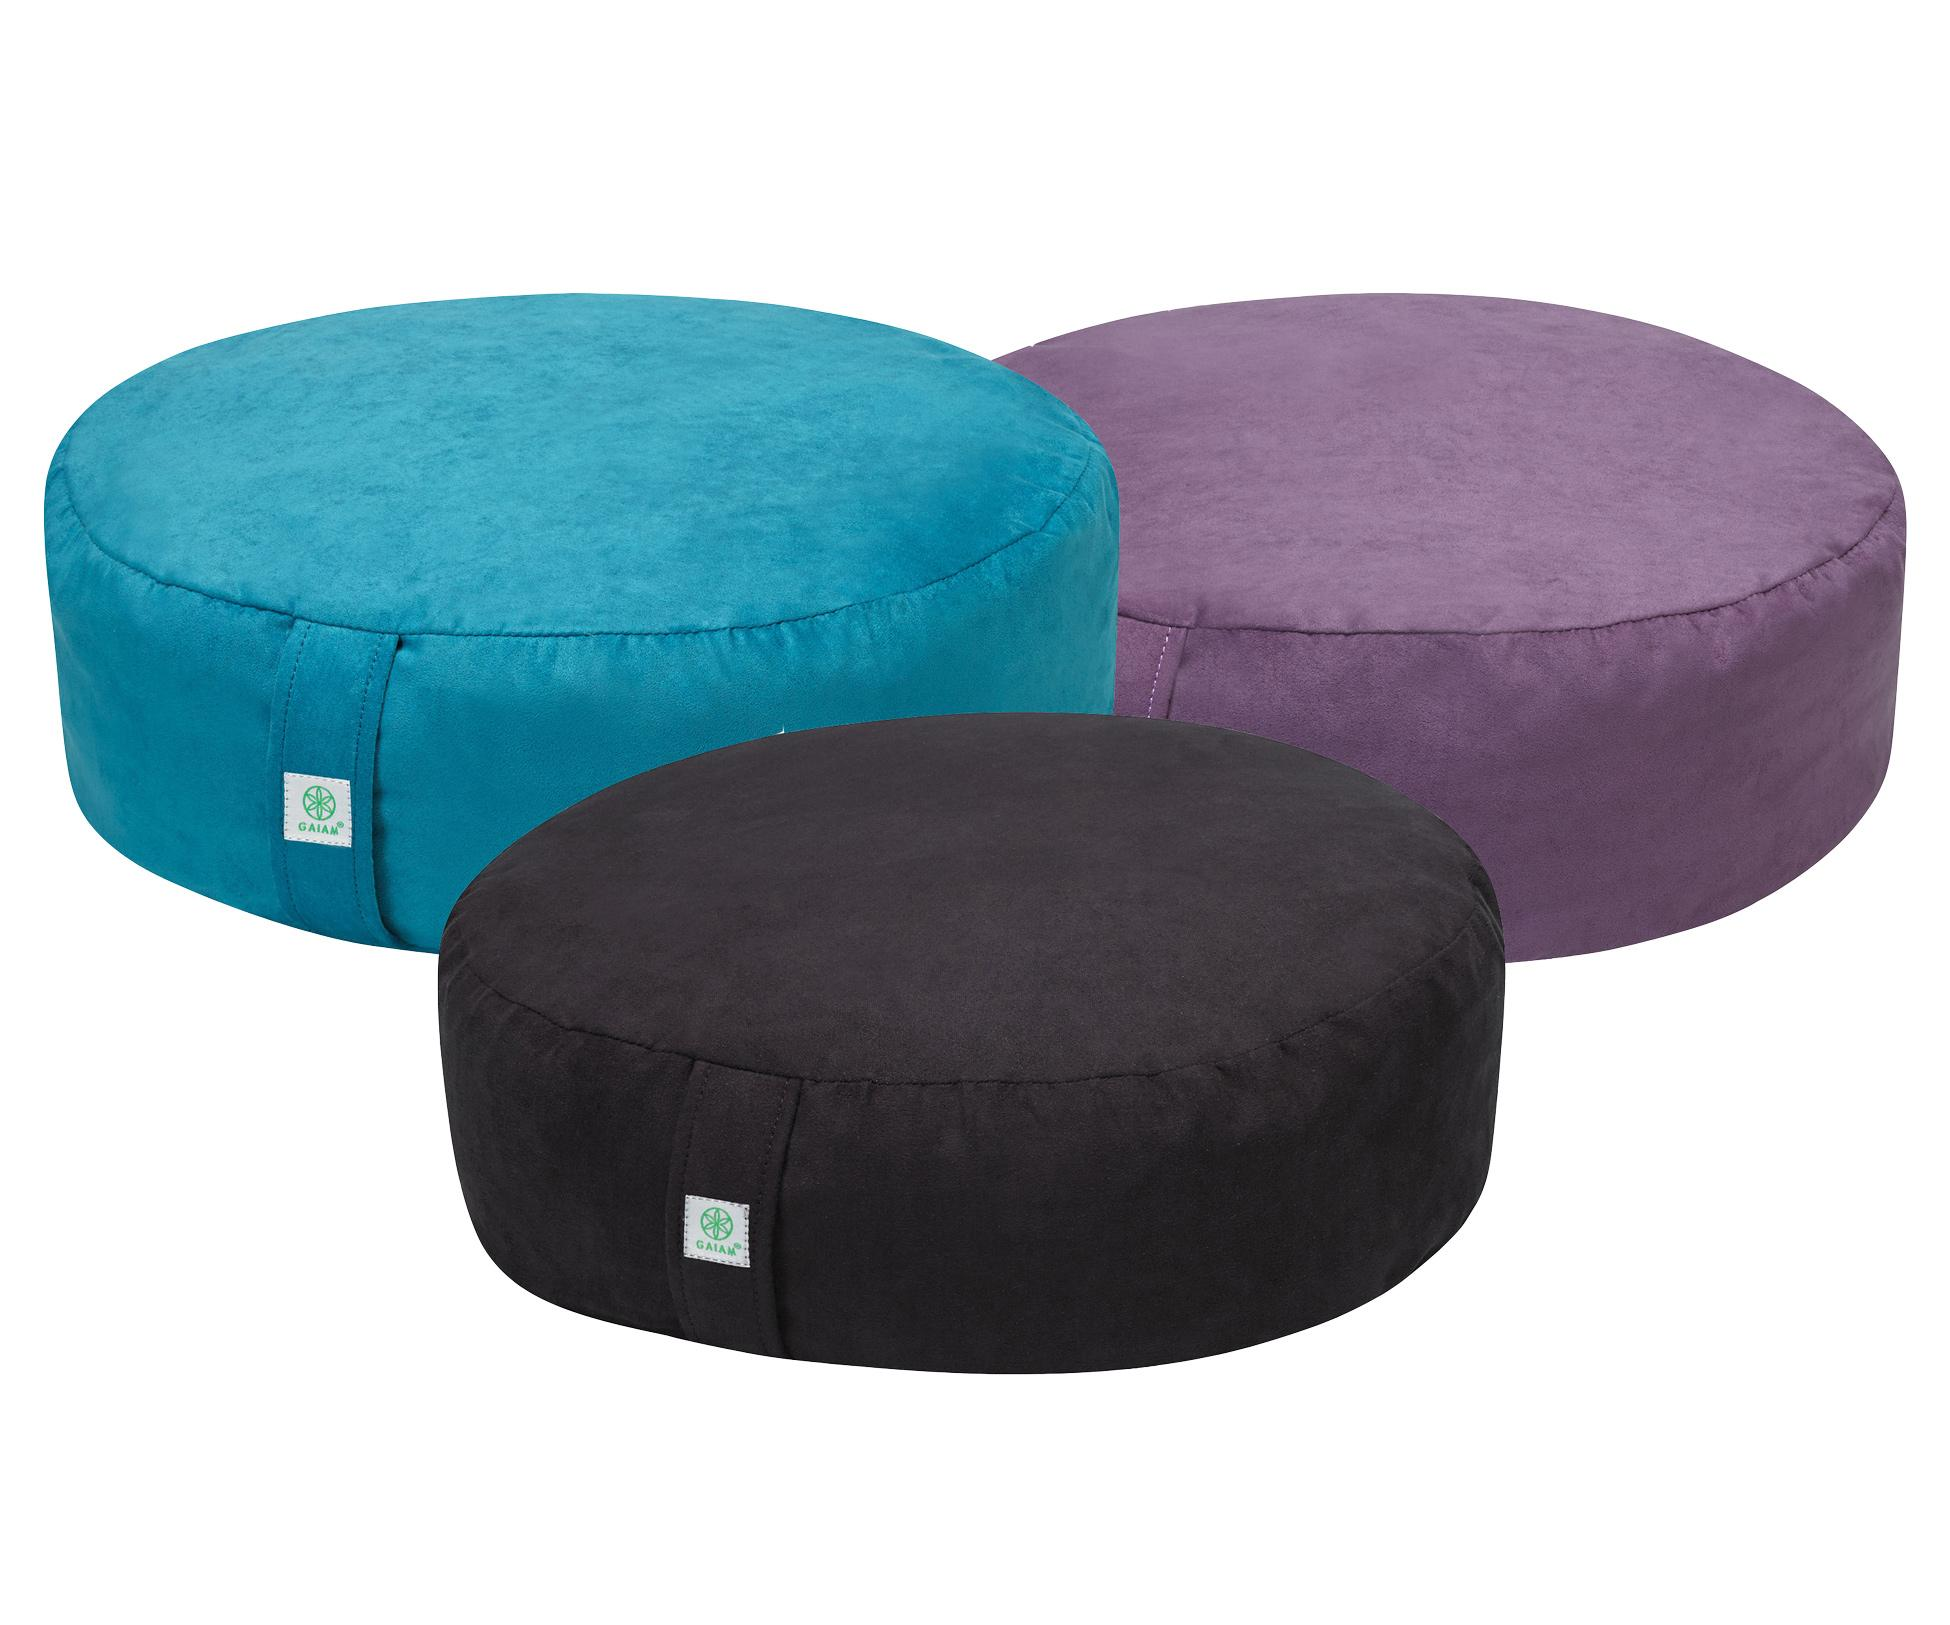 Amazon.com : Gaiam Zafu Meditation Cushion, Black : Sports